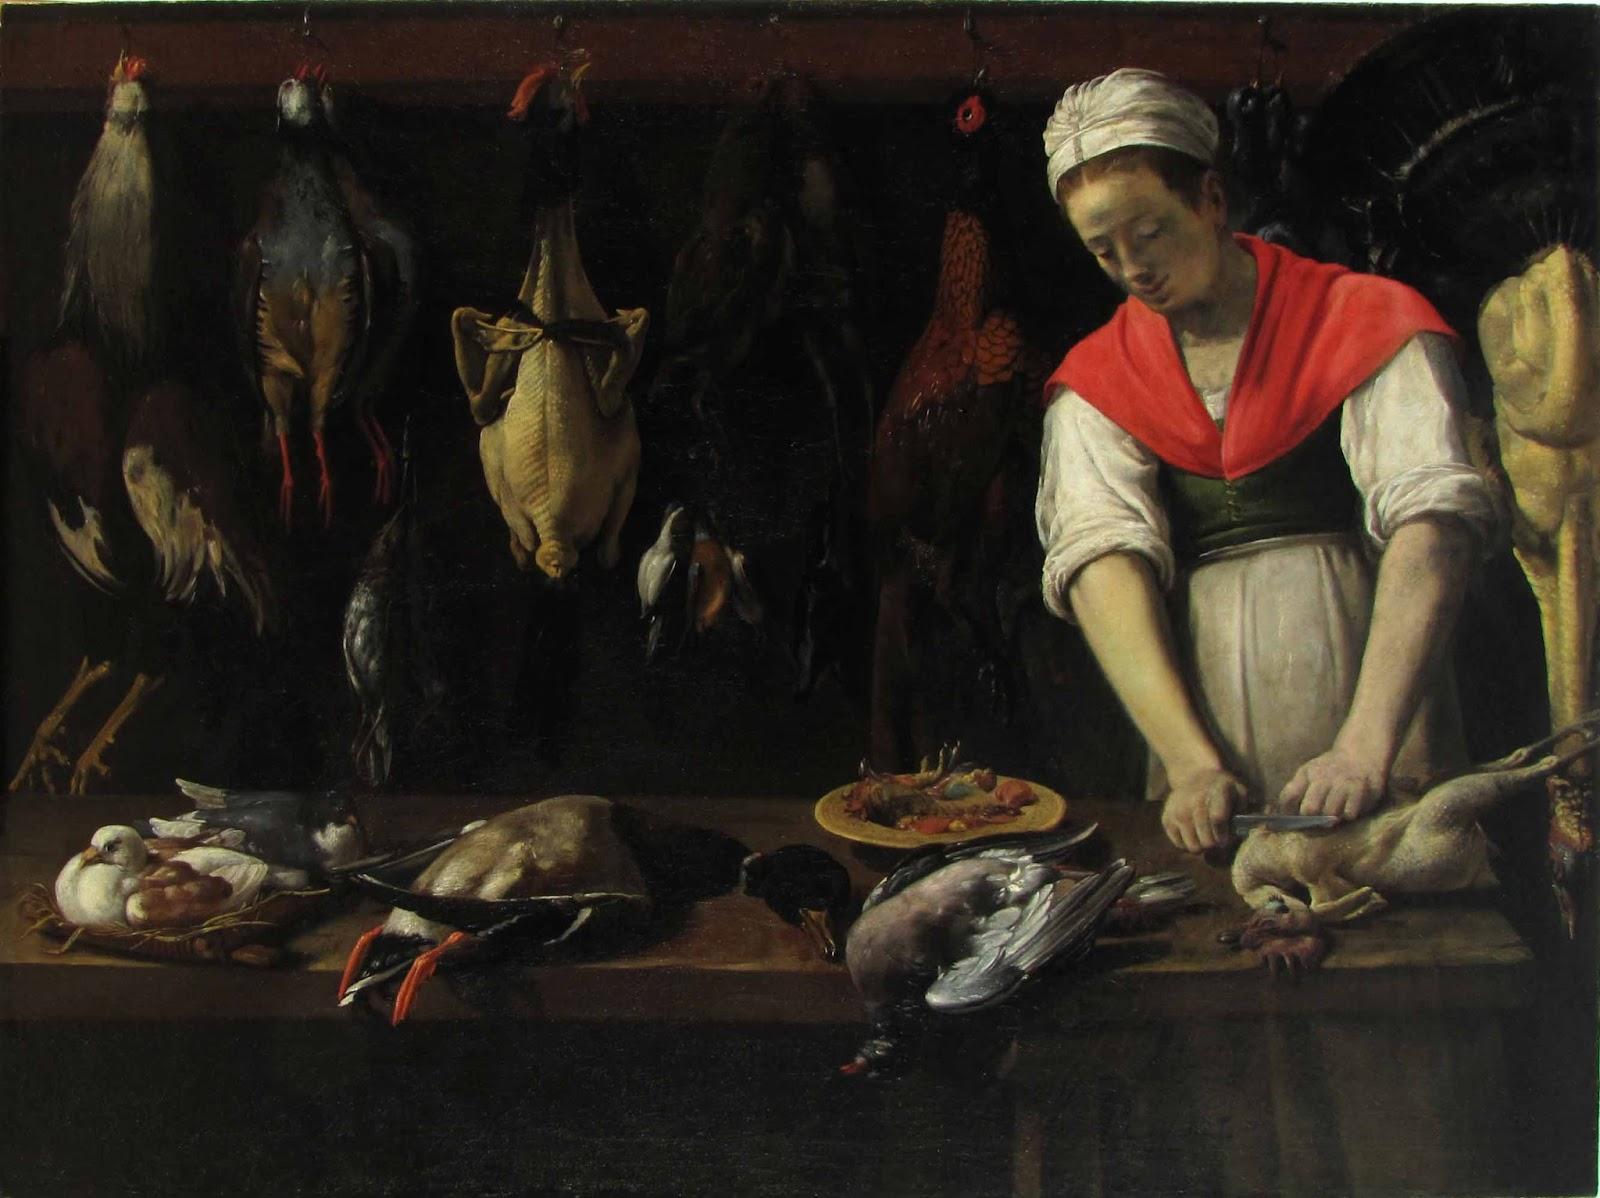 Senza Confini: NELLE ANTICHE CUCINE Cucine Storiche E Cucine Dipinte #A43427 1600 1198 Foto Di Cucine Americane